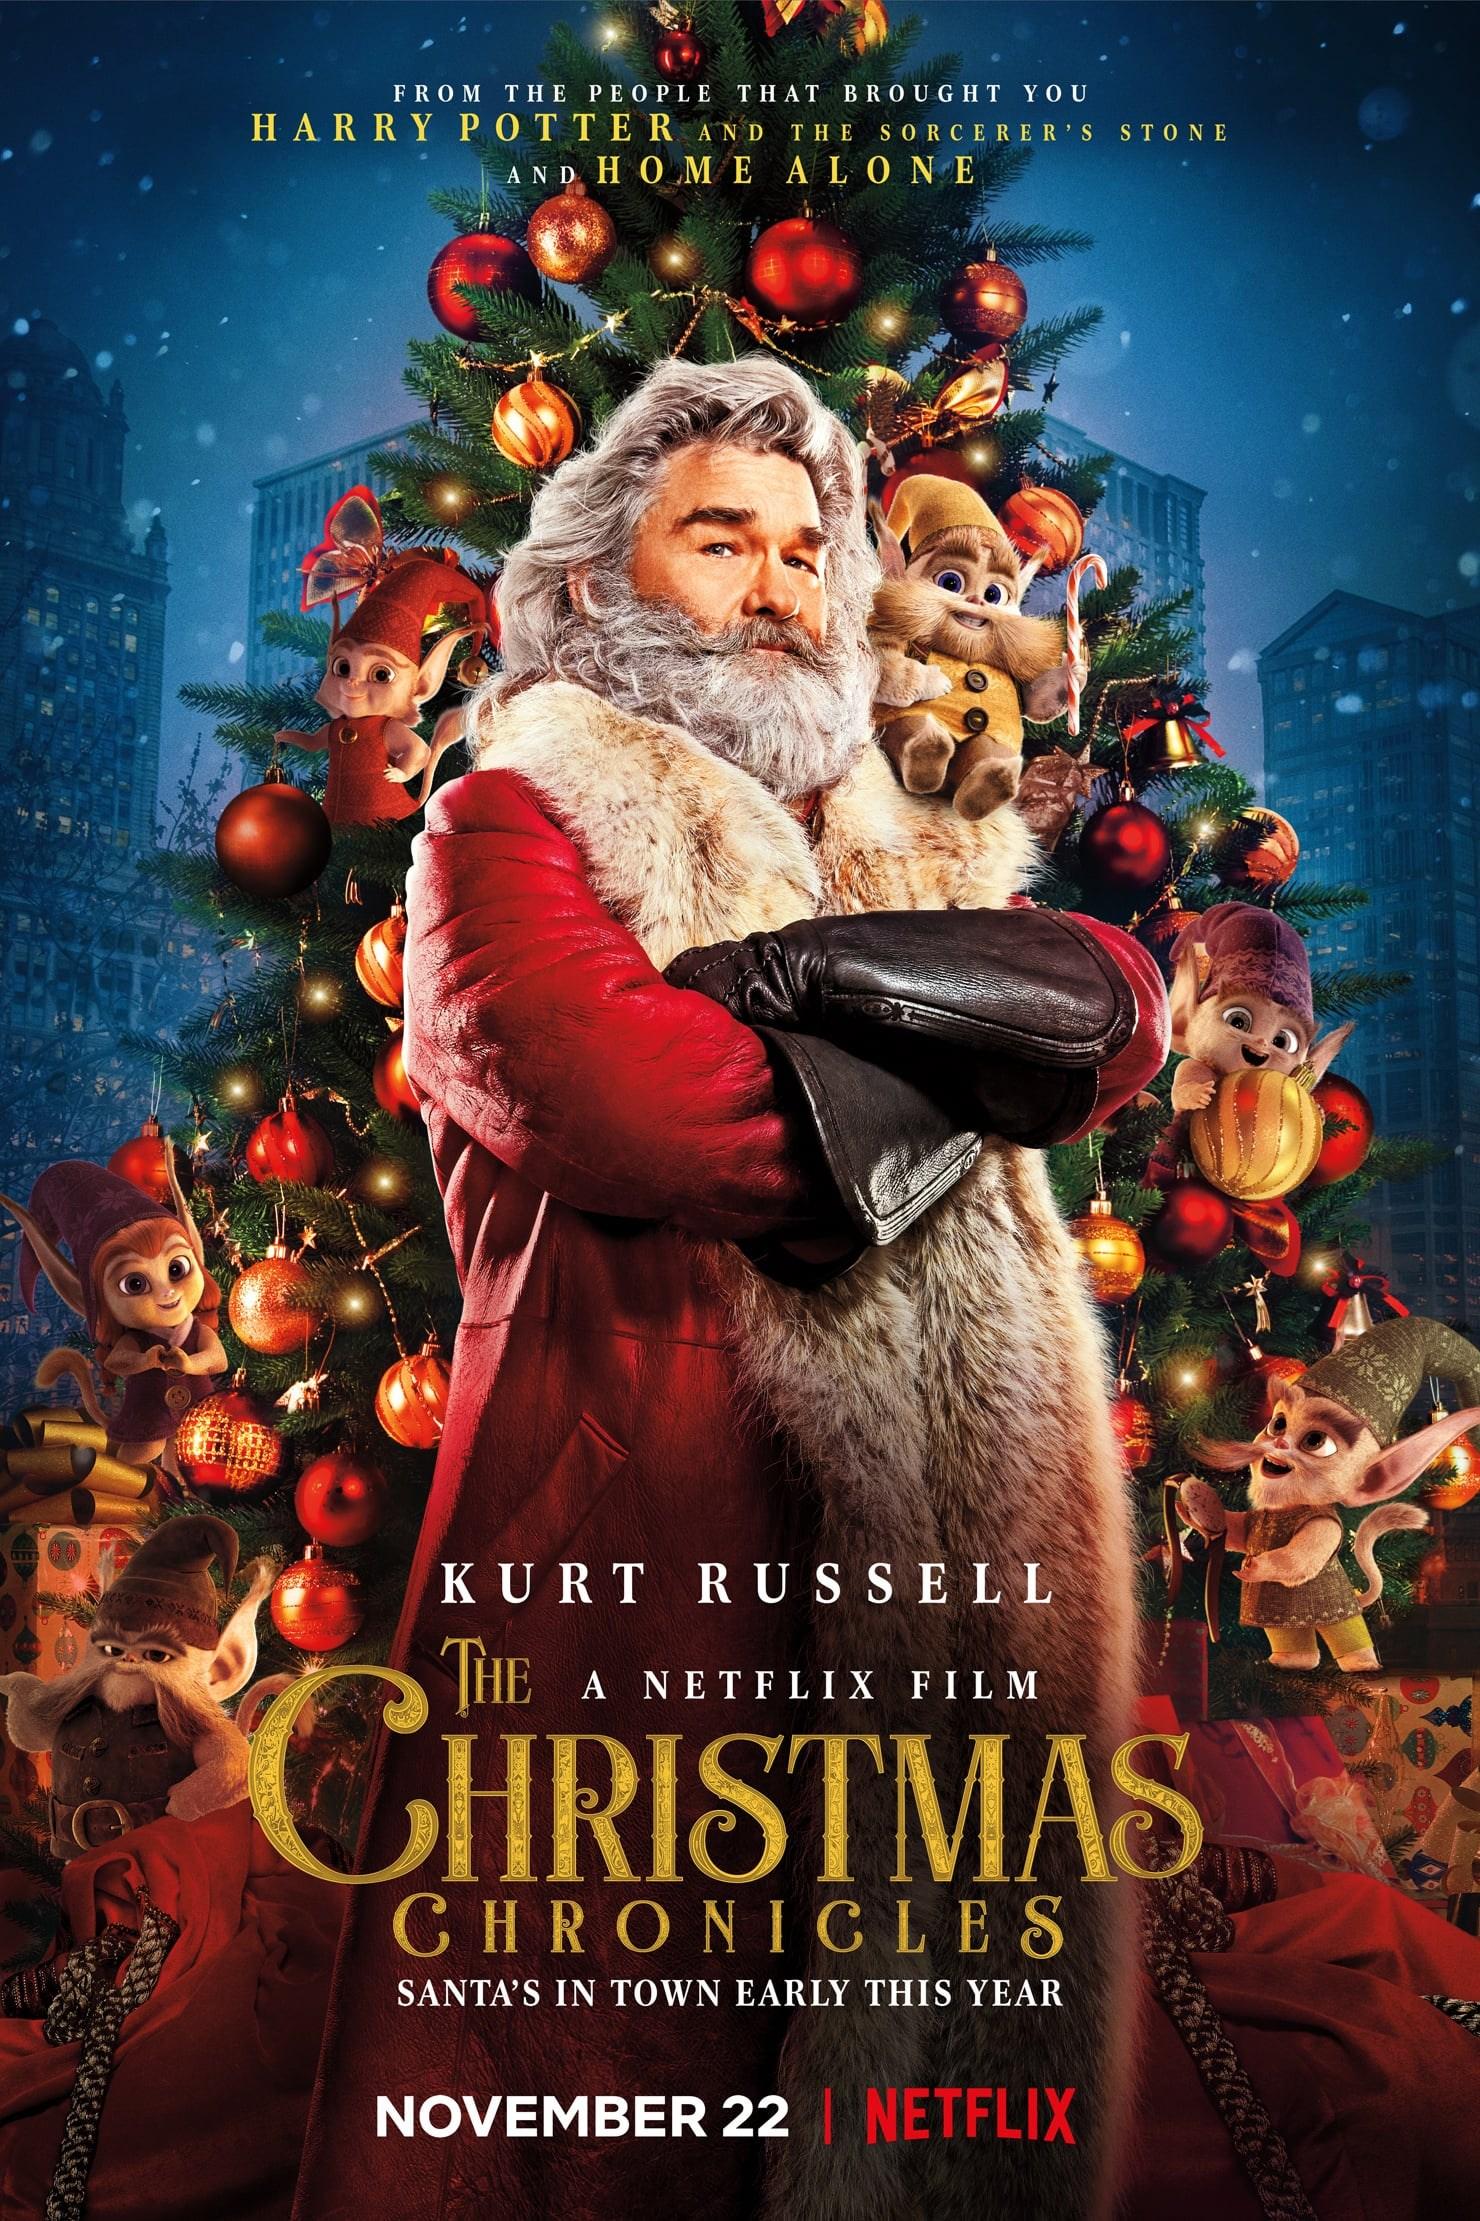 The Christmas Chronicles 2020 Hdrip Xvid Ac3-Evo Subscene   The Christmas Chronicles English subtitle